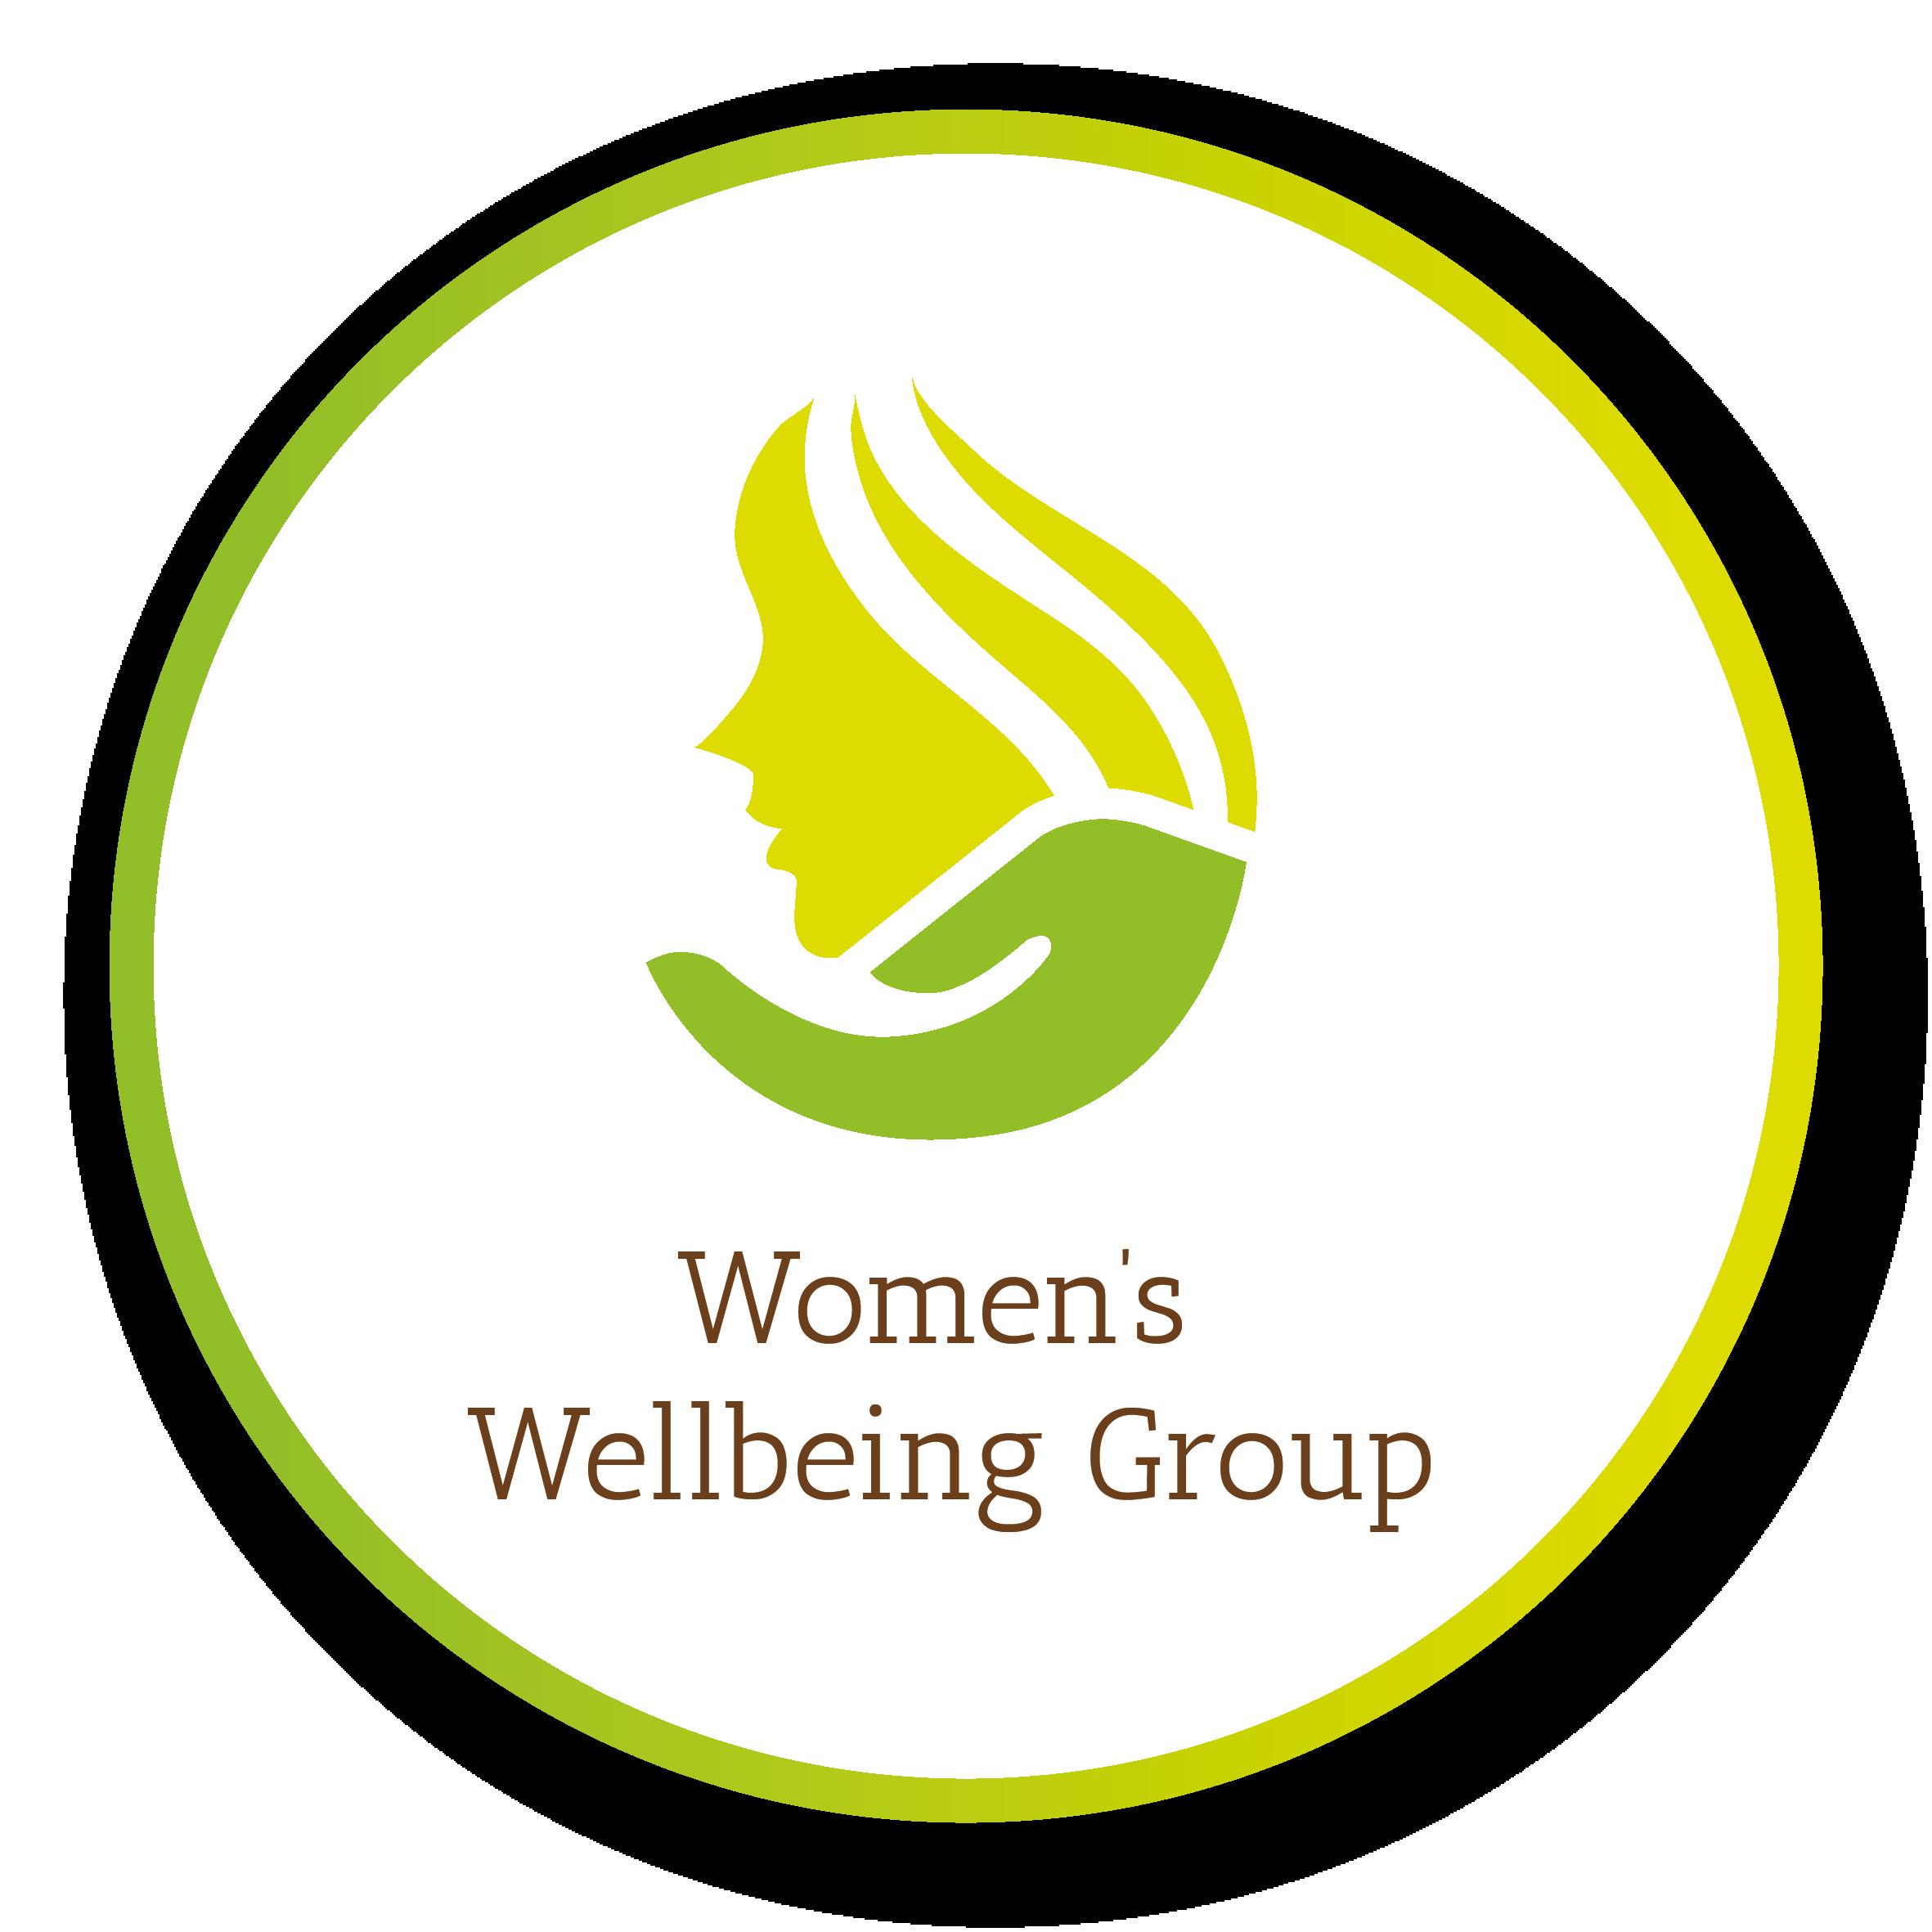 Women's Wellbeing Minorities Group